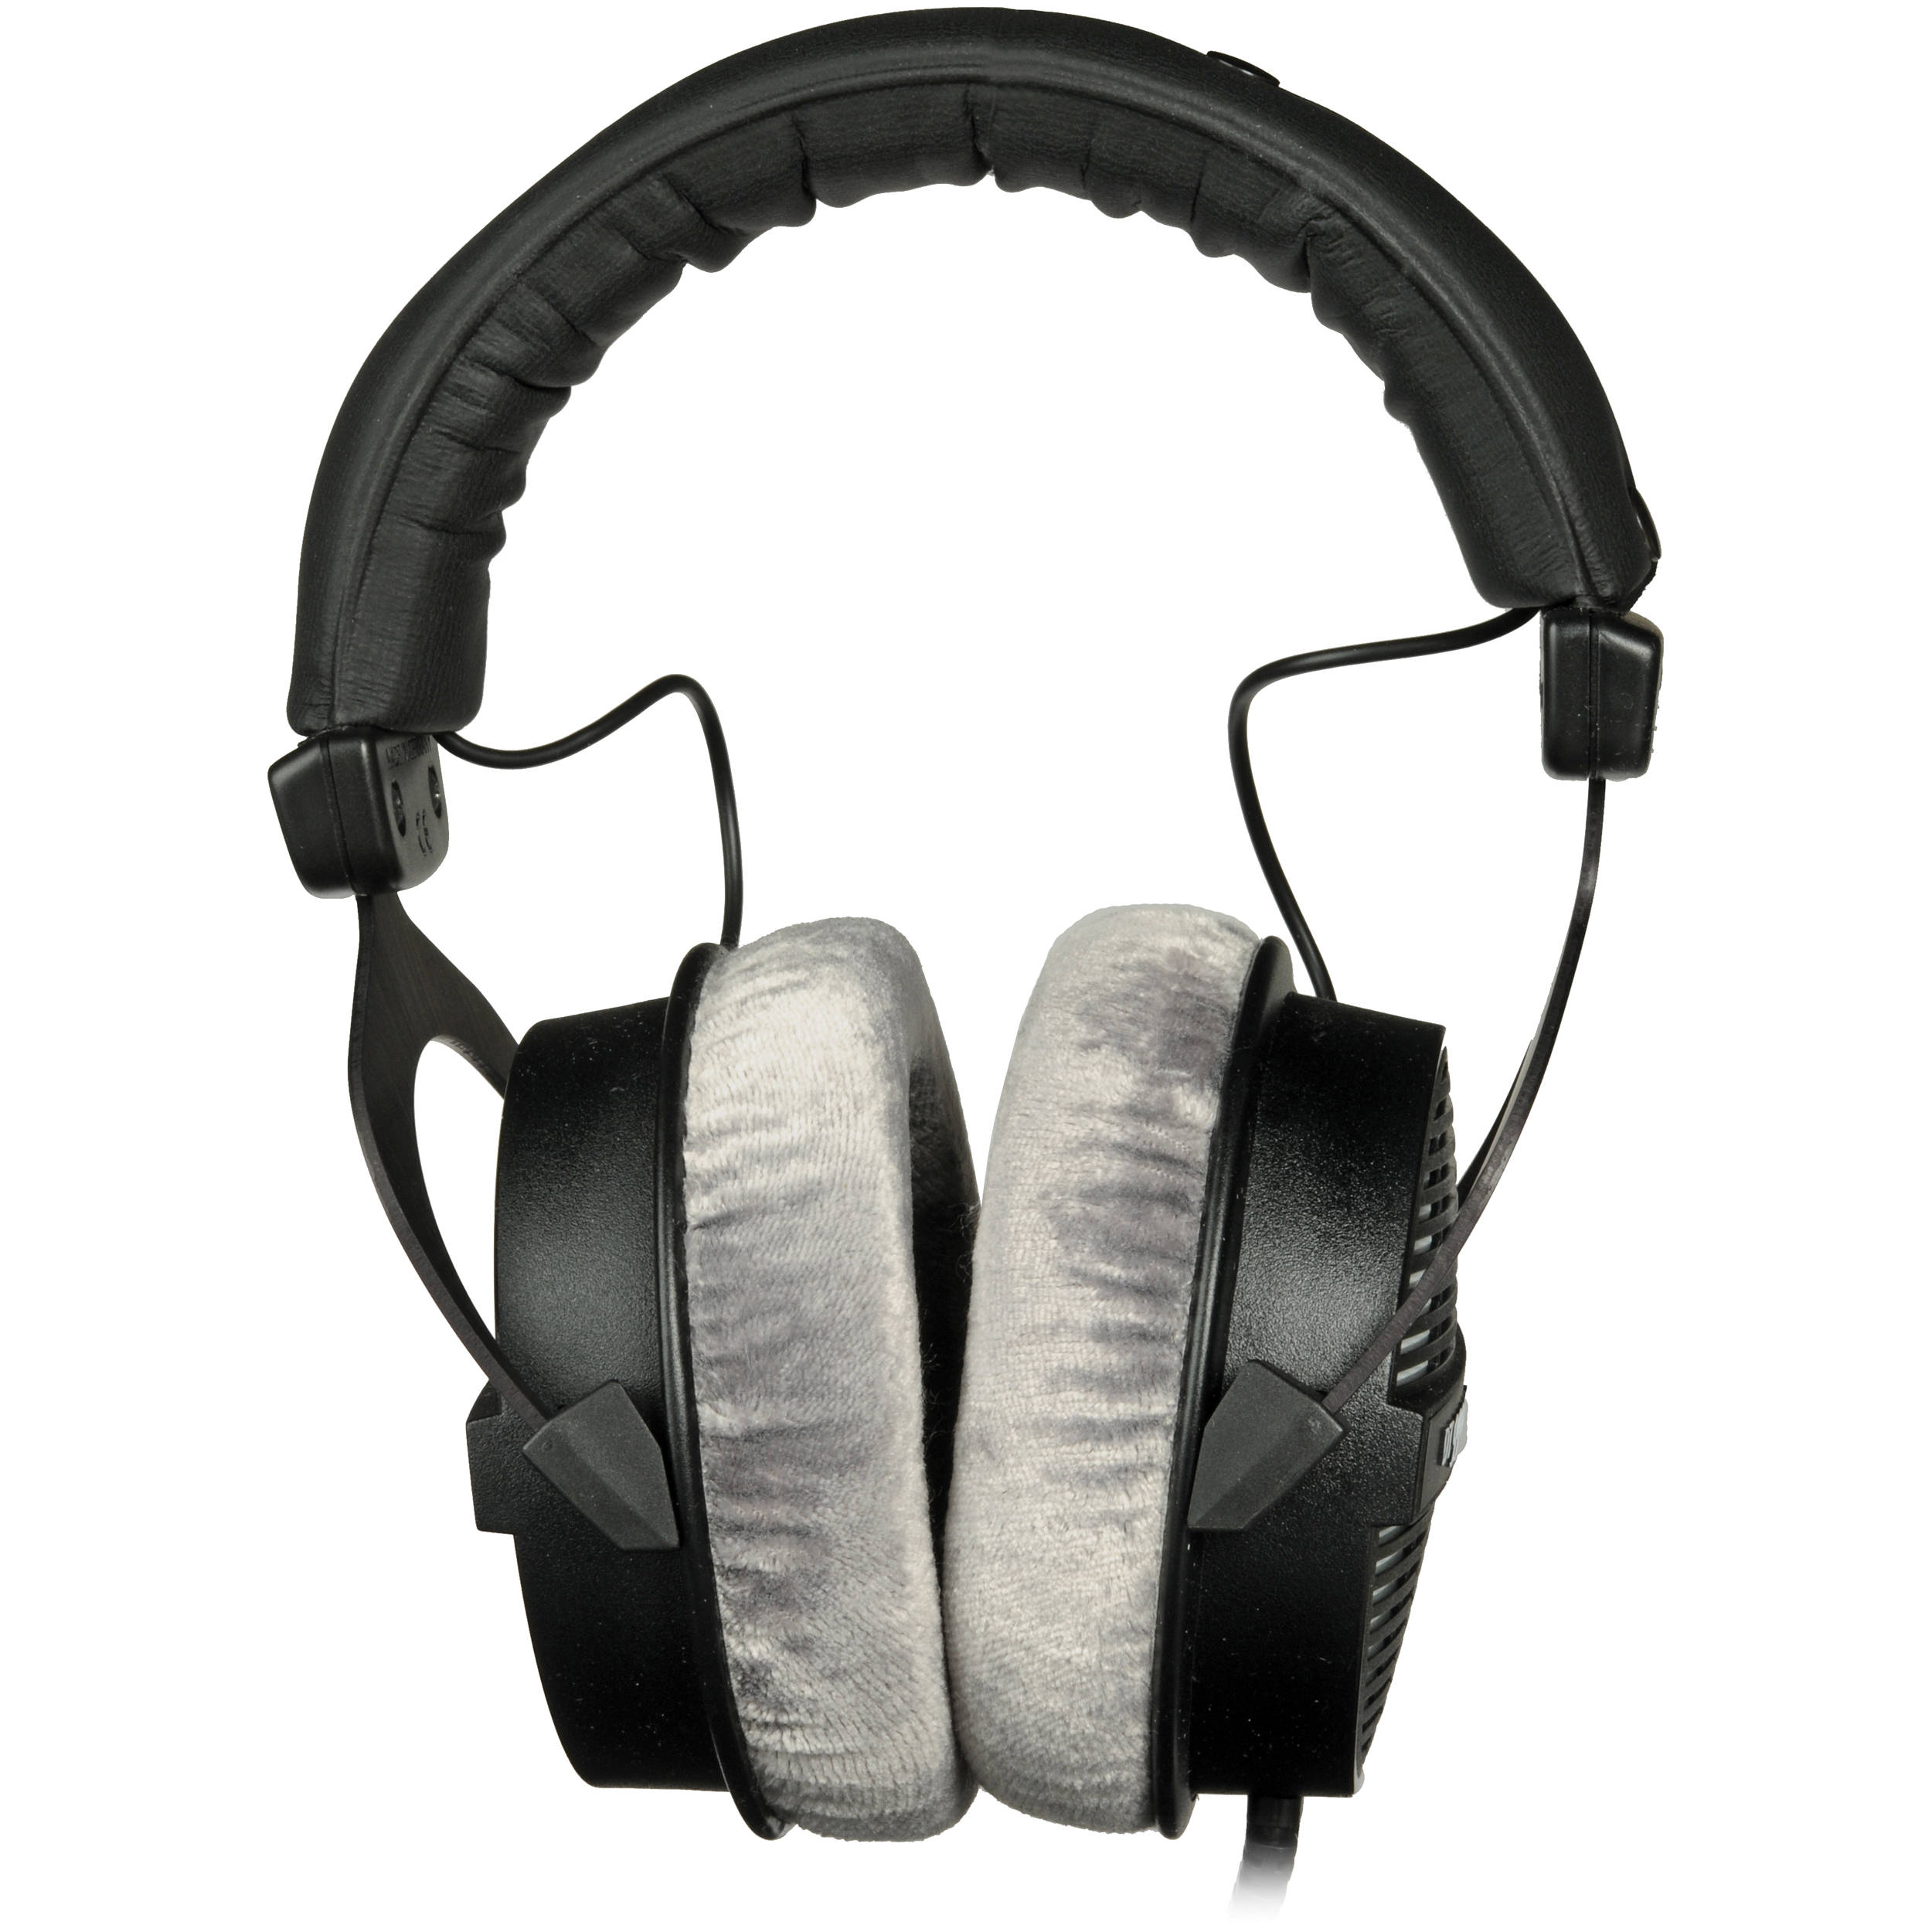 beyerdynamic dt 990 pro studio headphones. Black Bedroom Furniture Sets. Home Design Ideas